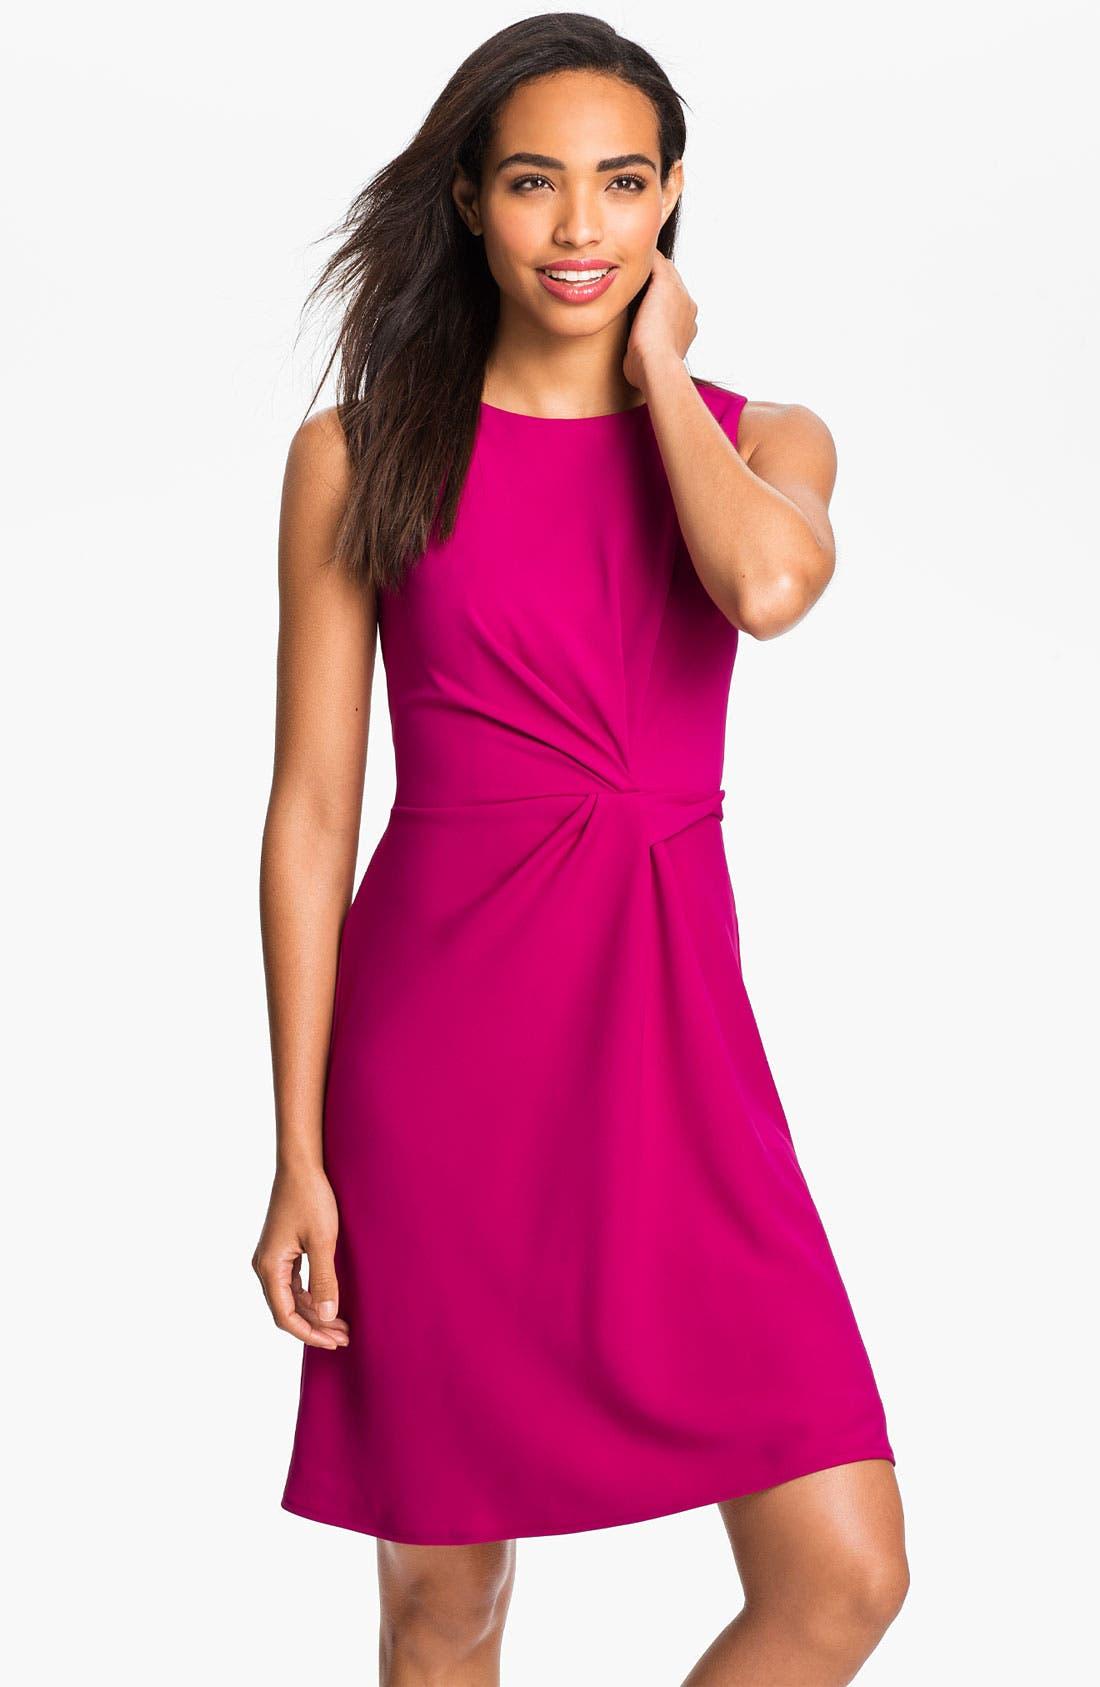 Main Image - Donna Ricco Sleeveless Side Tie Dress